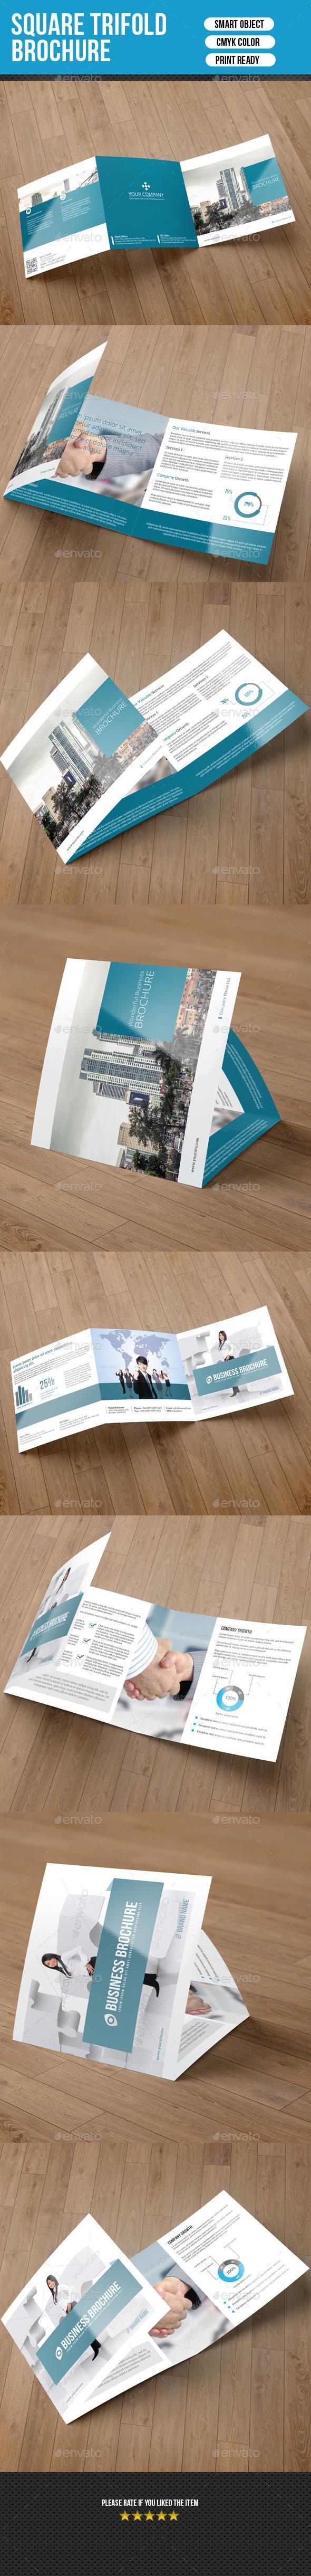 2 In 1 Square Trifold Brochure-V16 - Corporate Brochures